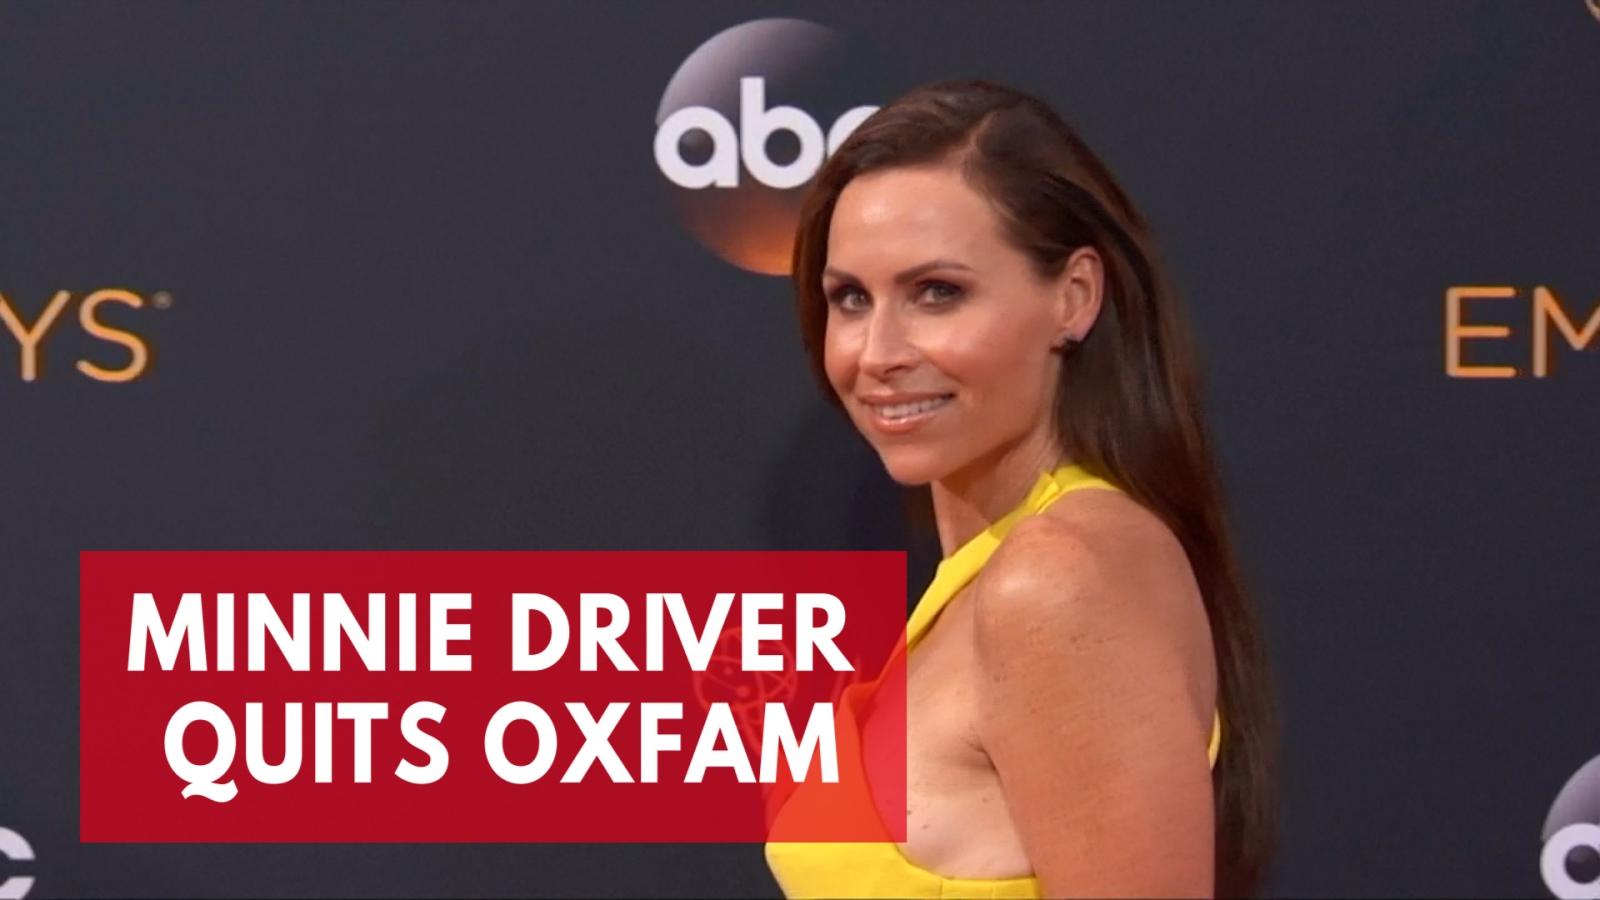 minnie-driver-quits-oxfam-ambassador-role